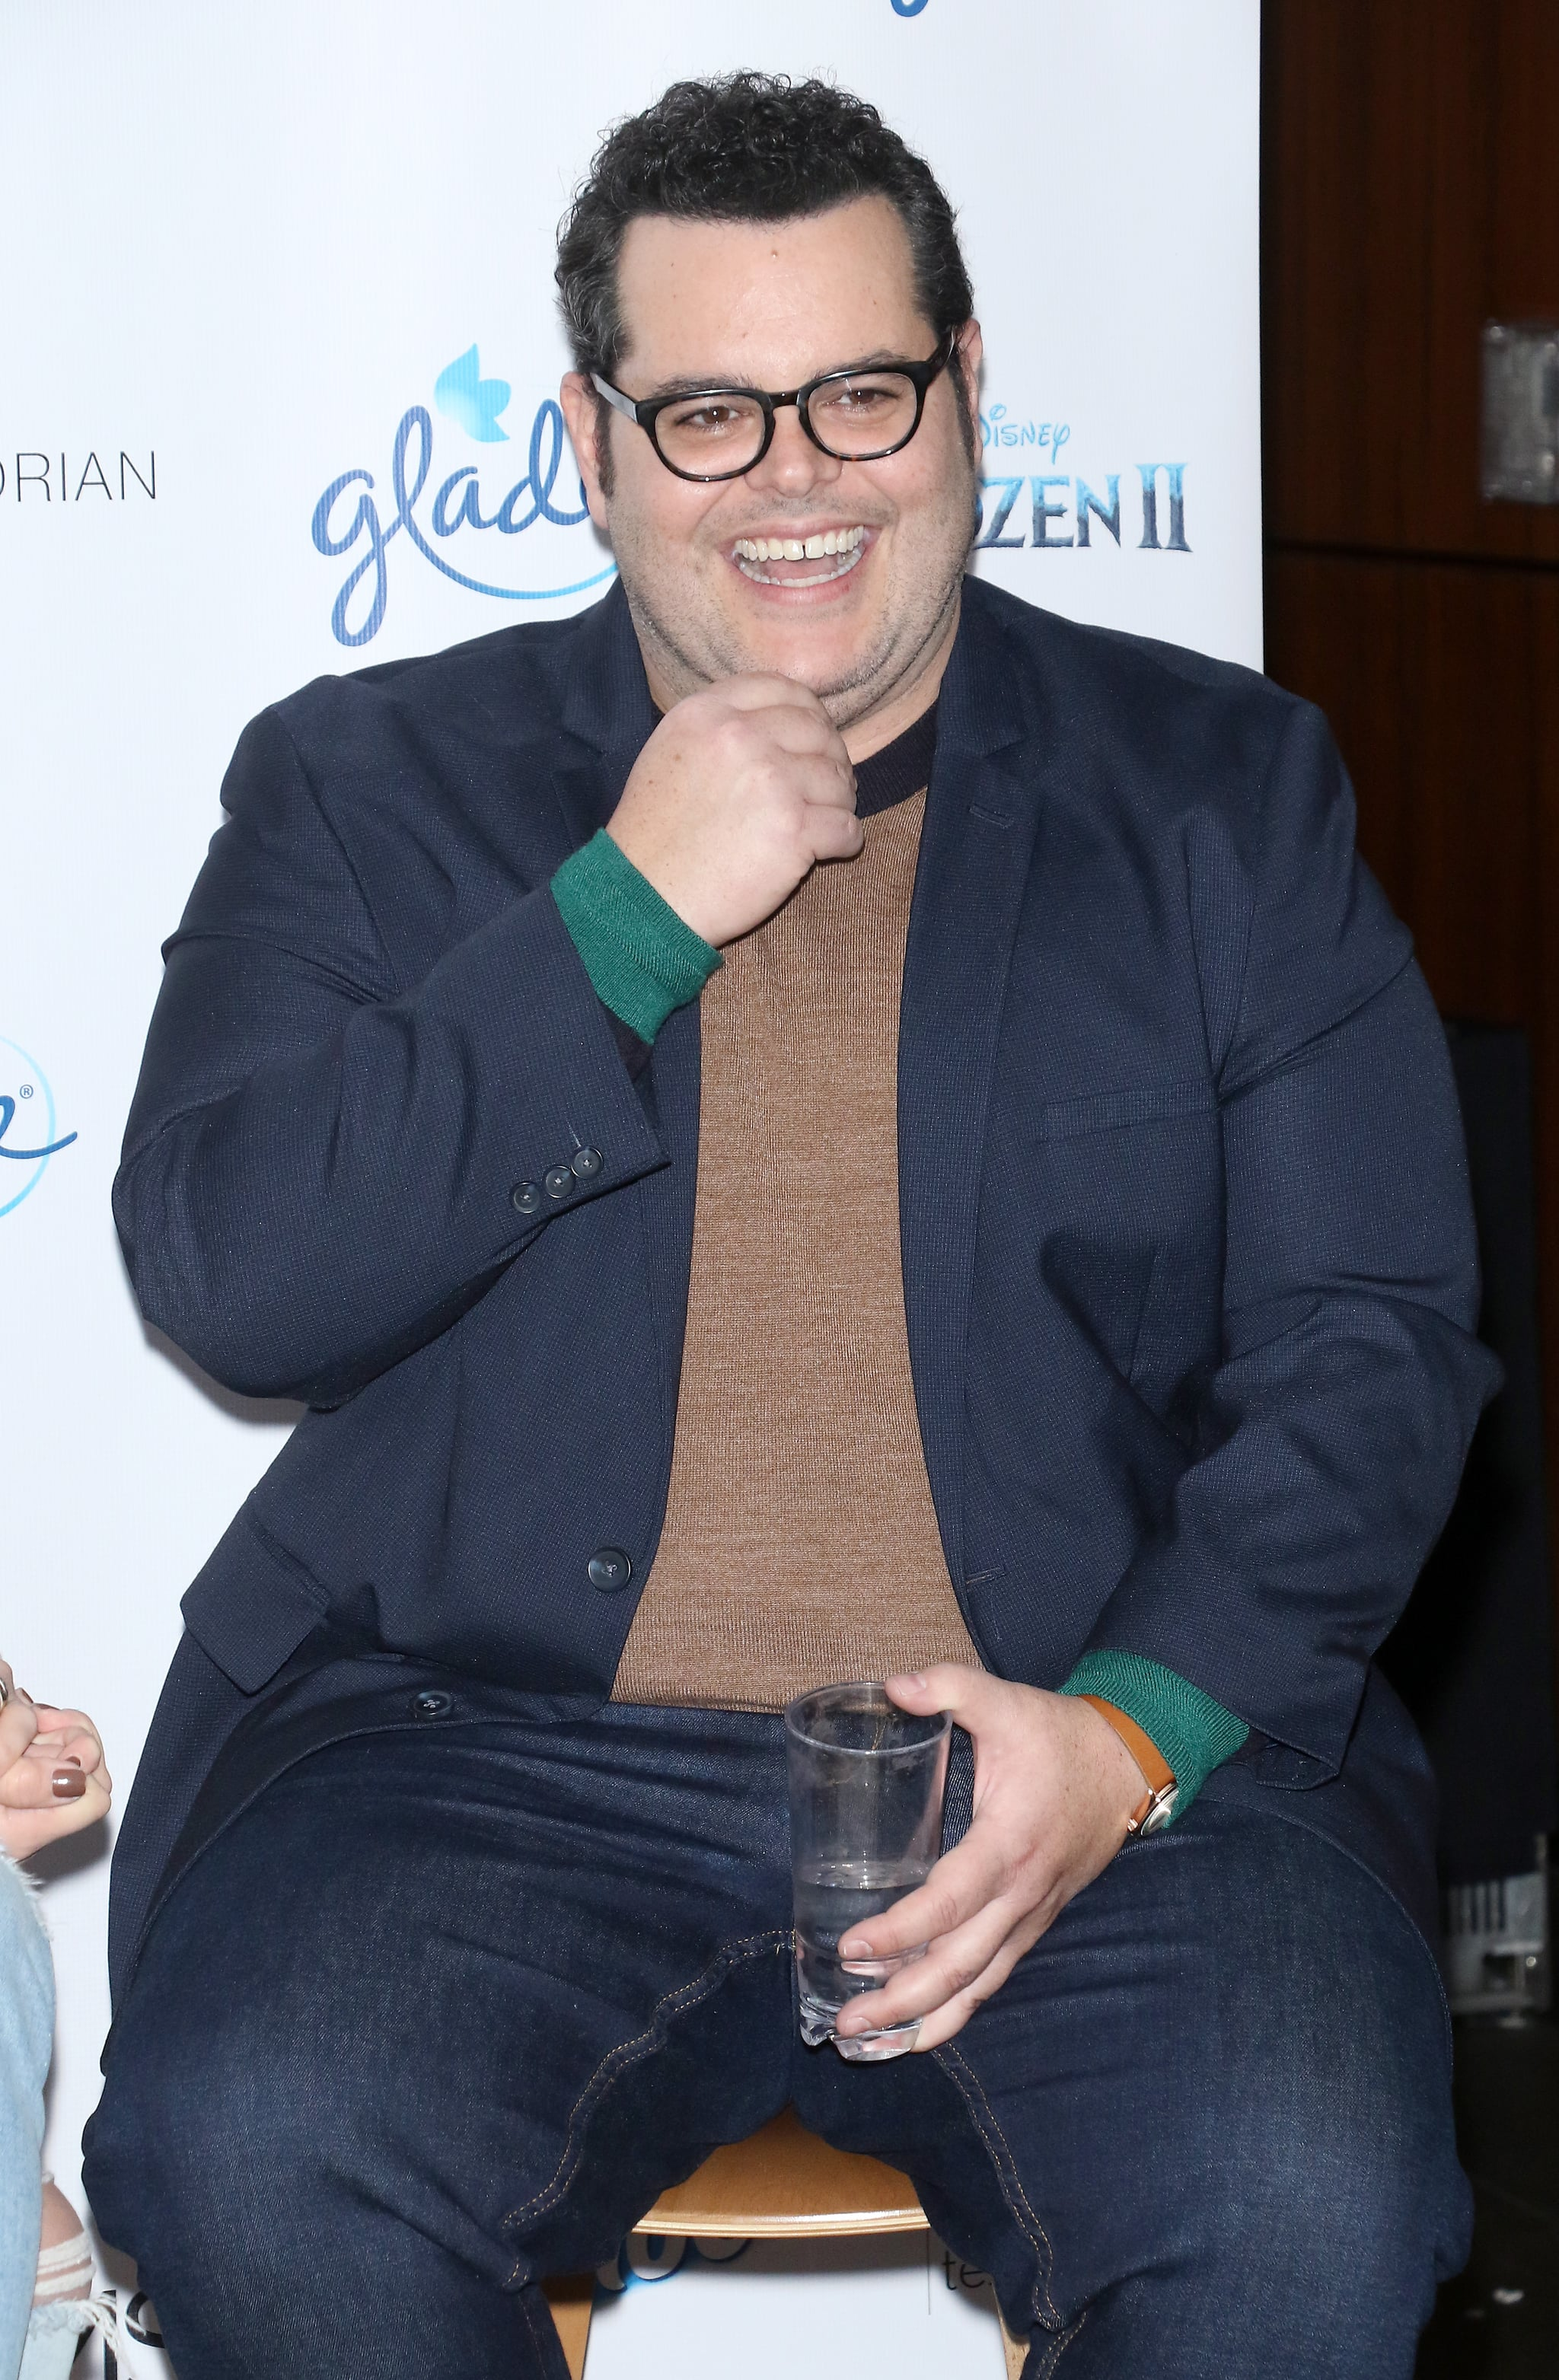 NEW YORK, NEW YORK - NOVEMBER 25: Actor Josh Gad attends The Moms celebration of